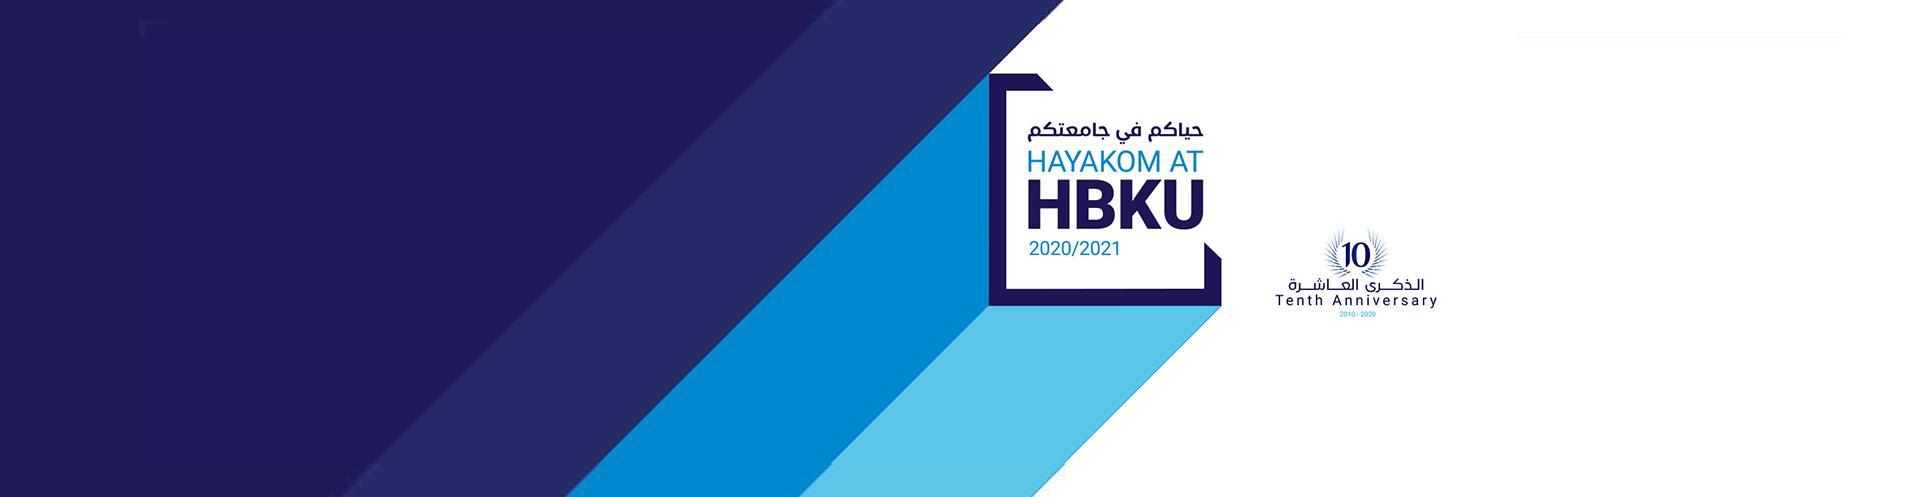 Start of Academic Year 2020/21